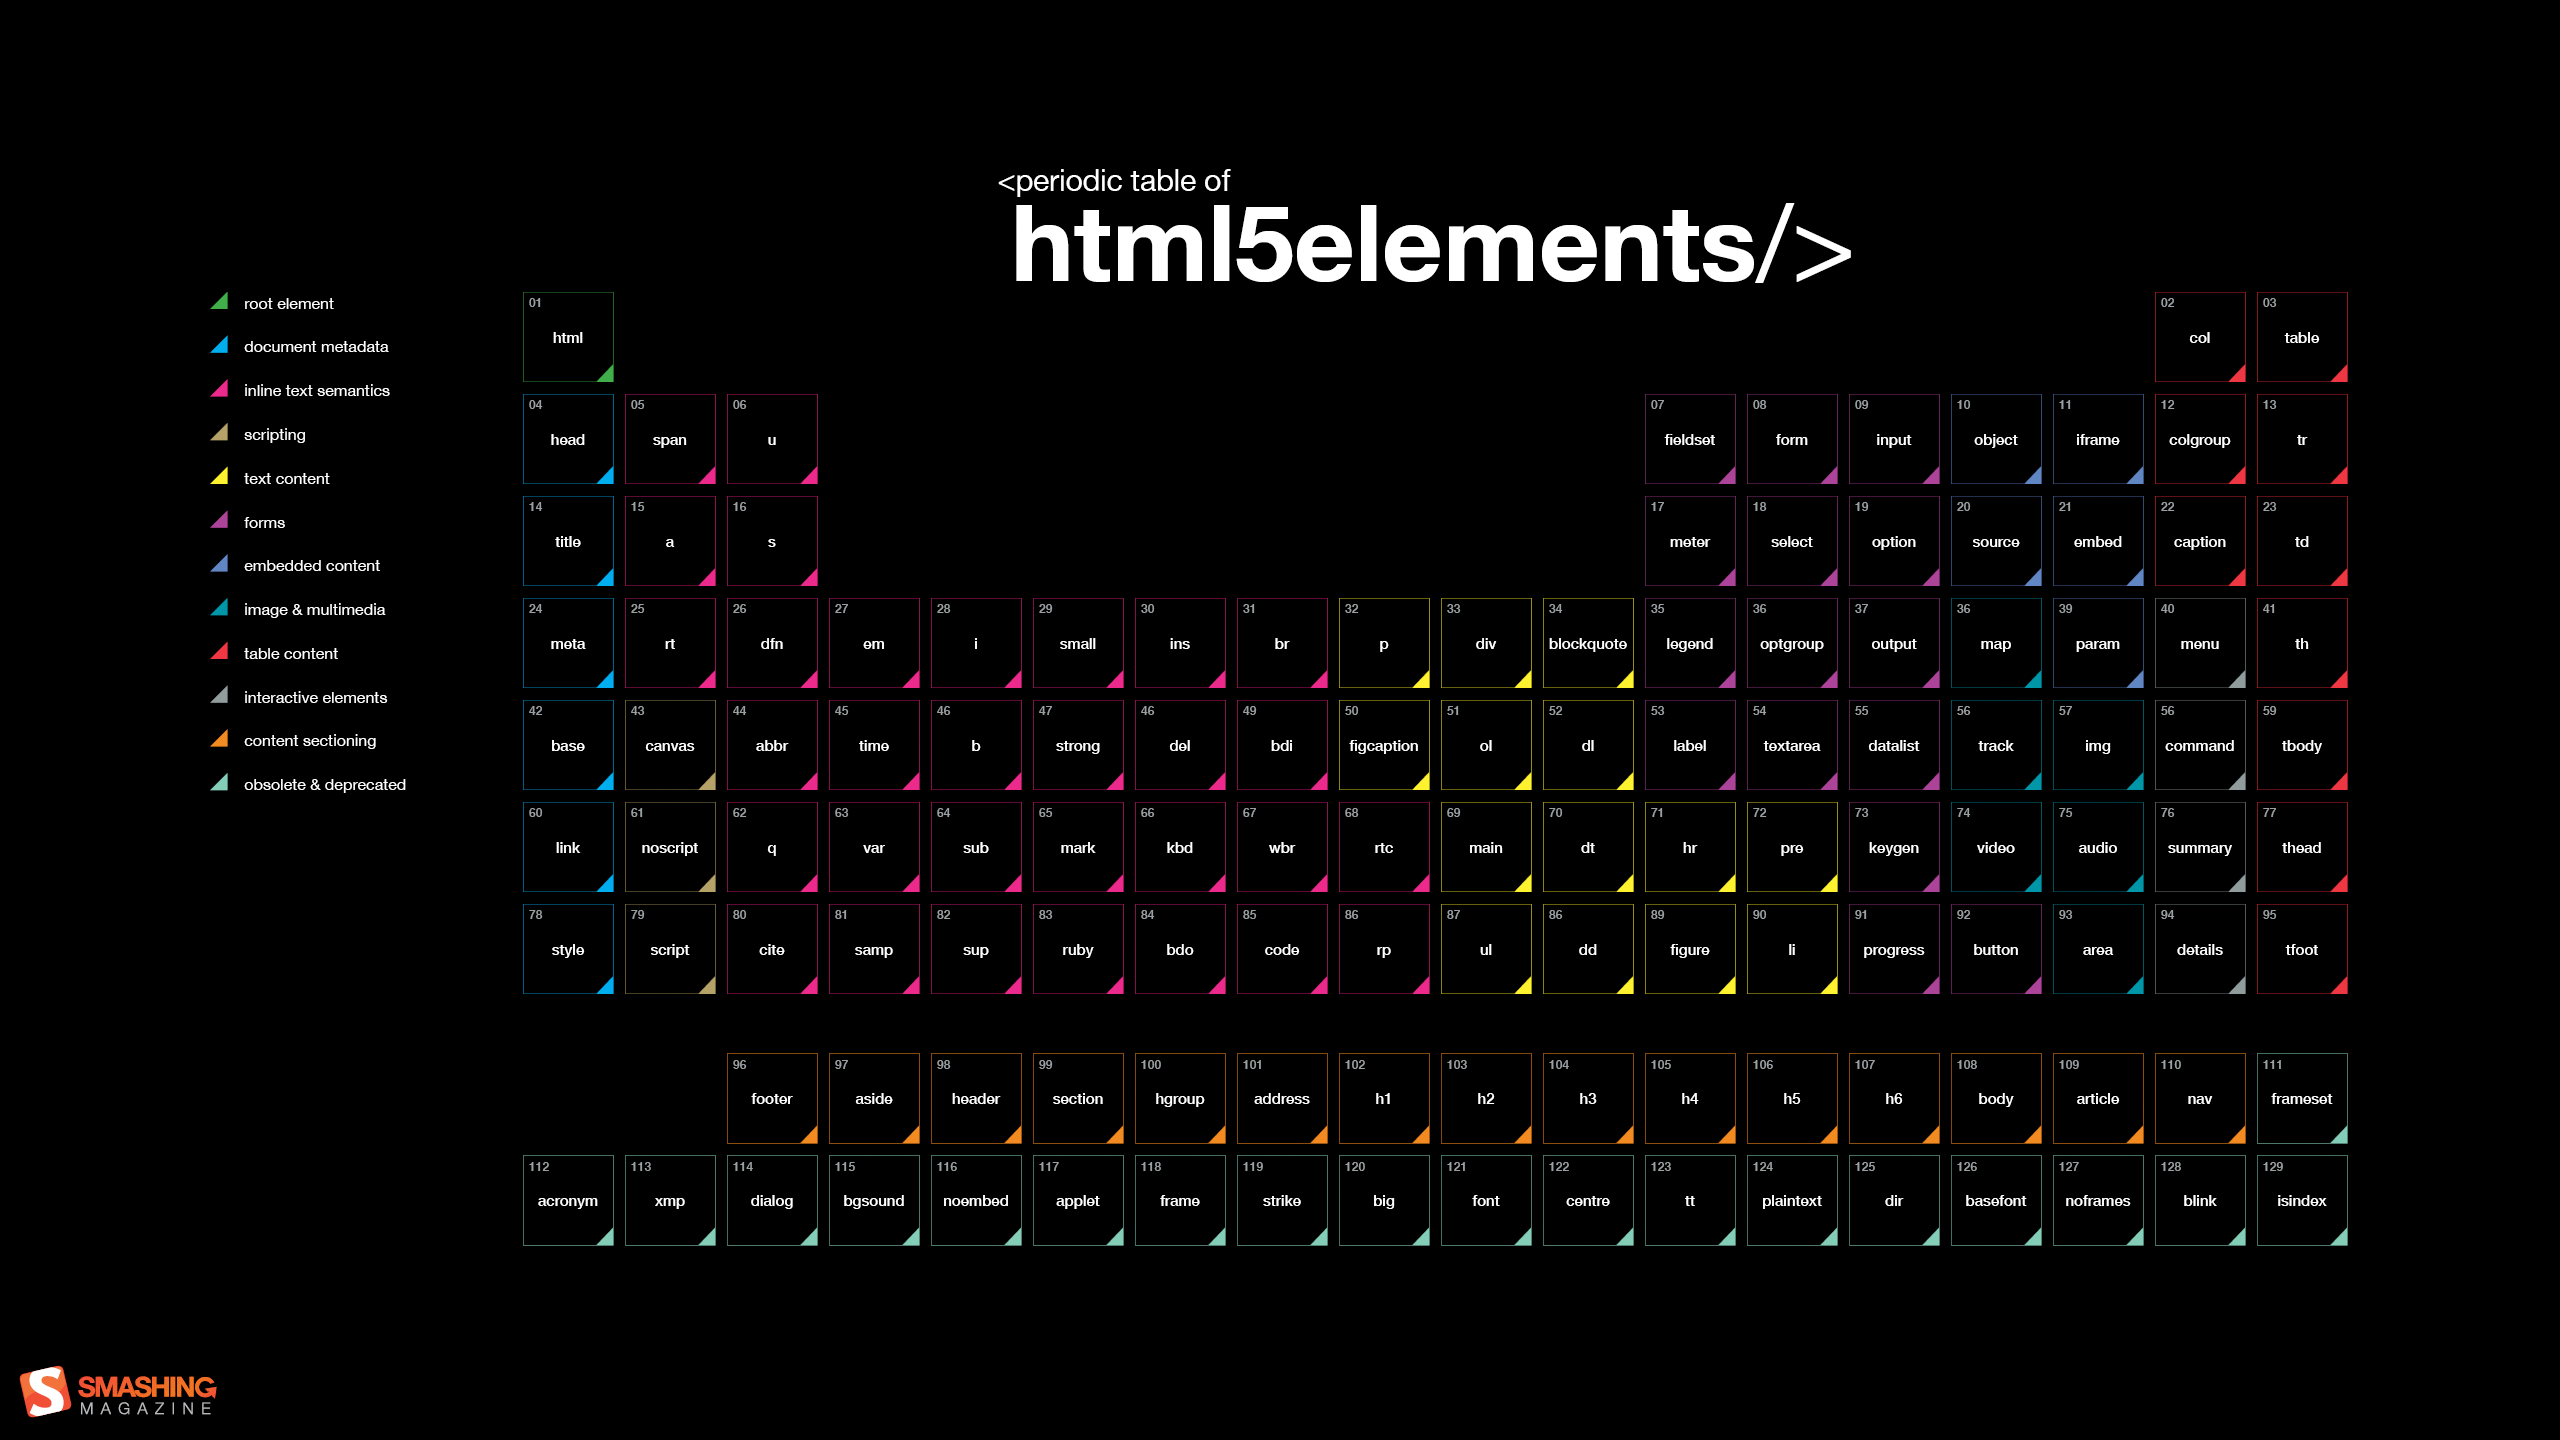 General 2560x1440 HTML code programming periodic table black background Smashing Magazine diagrams computer